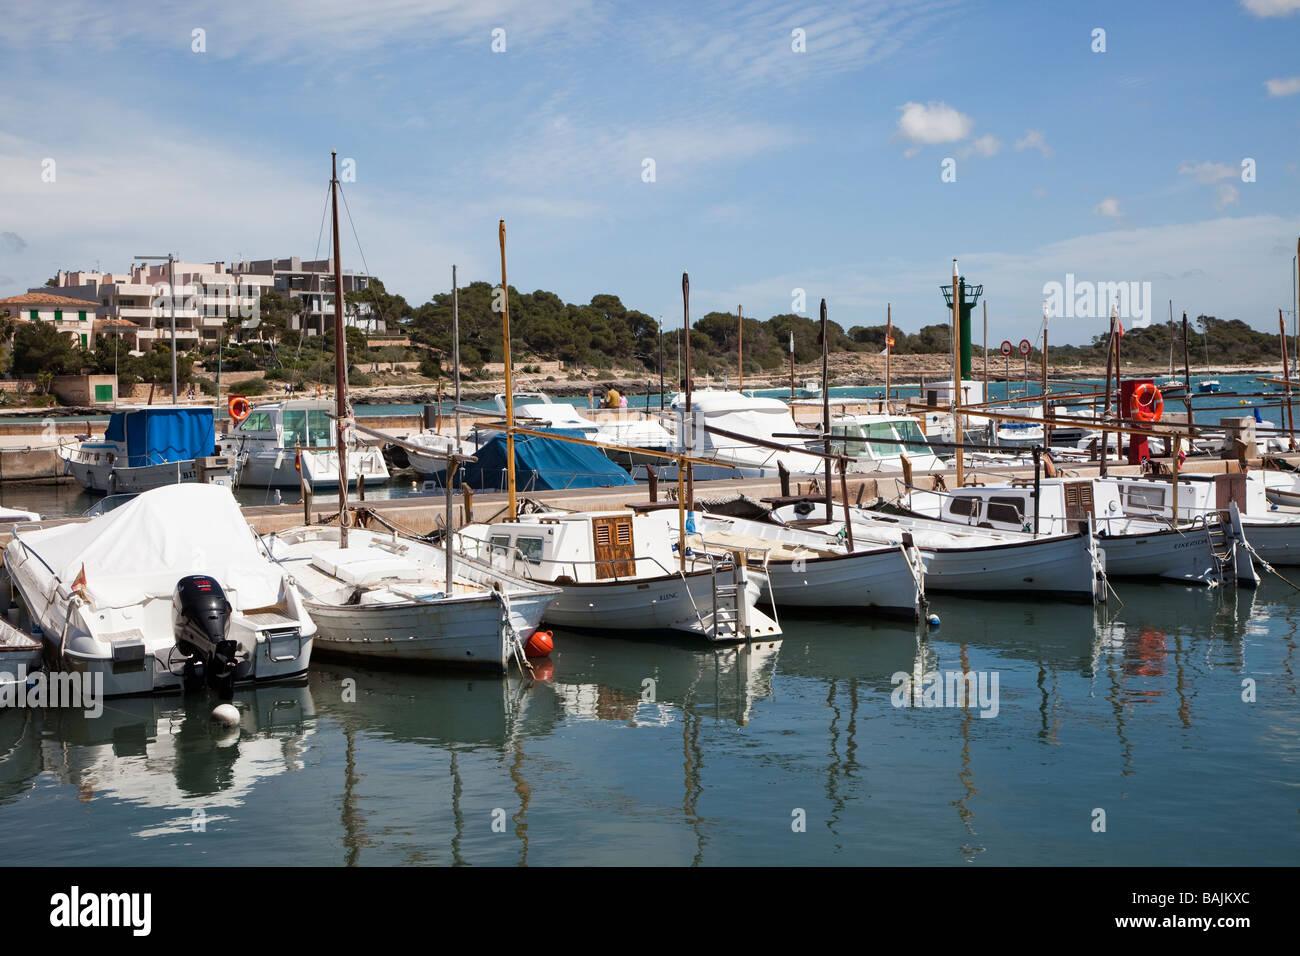 Fishing boats in harbour Colonia de Sant Jordi Mallorca Spain - Stock Image